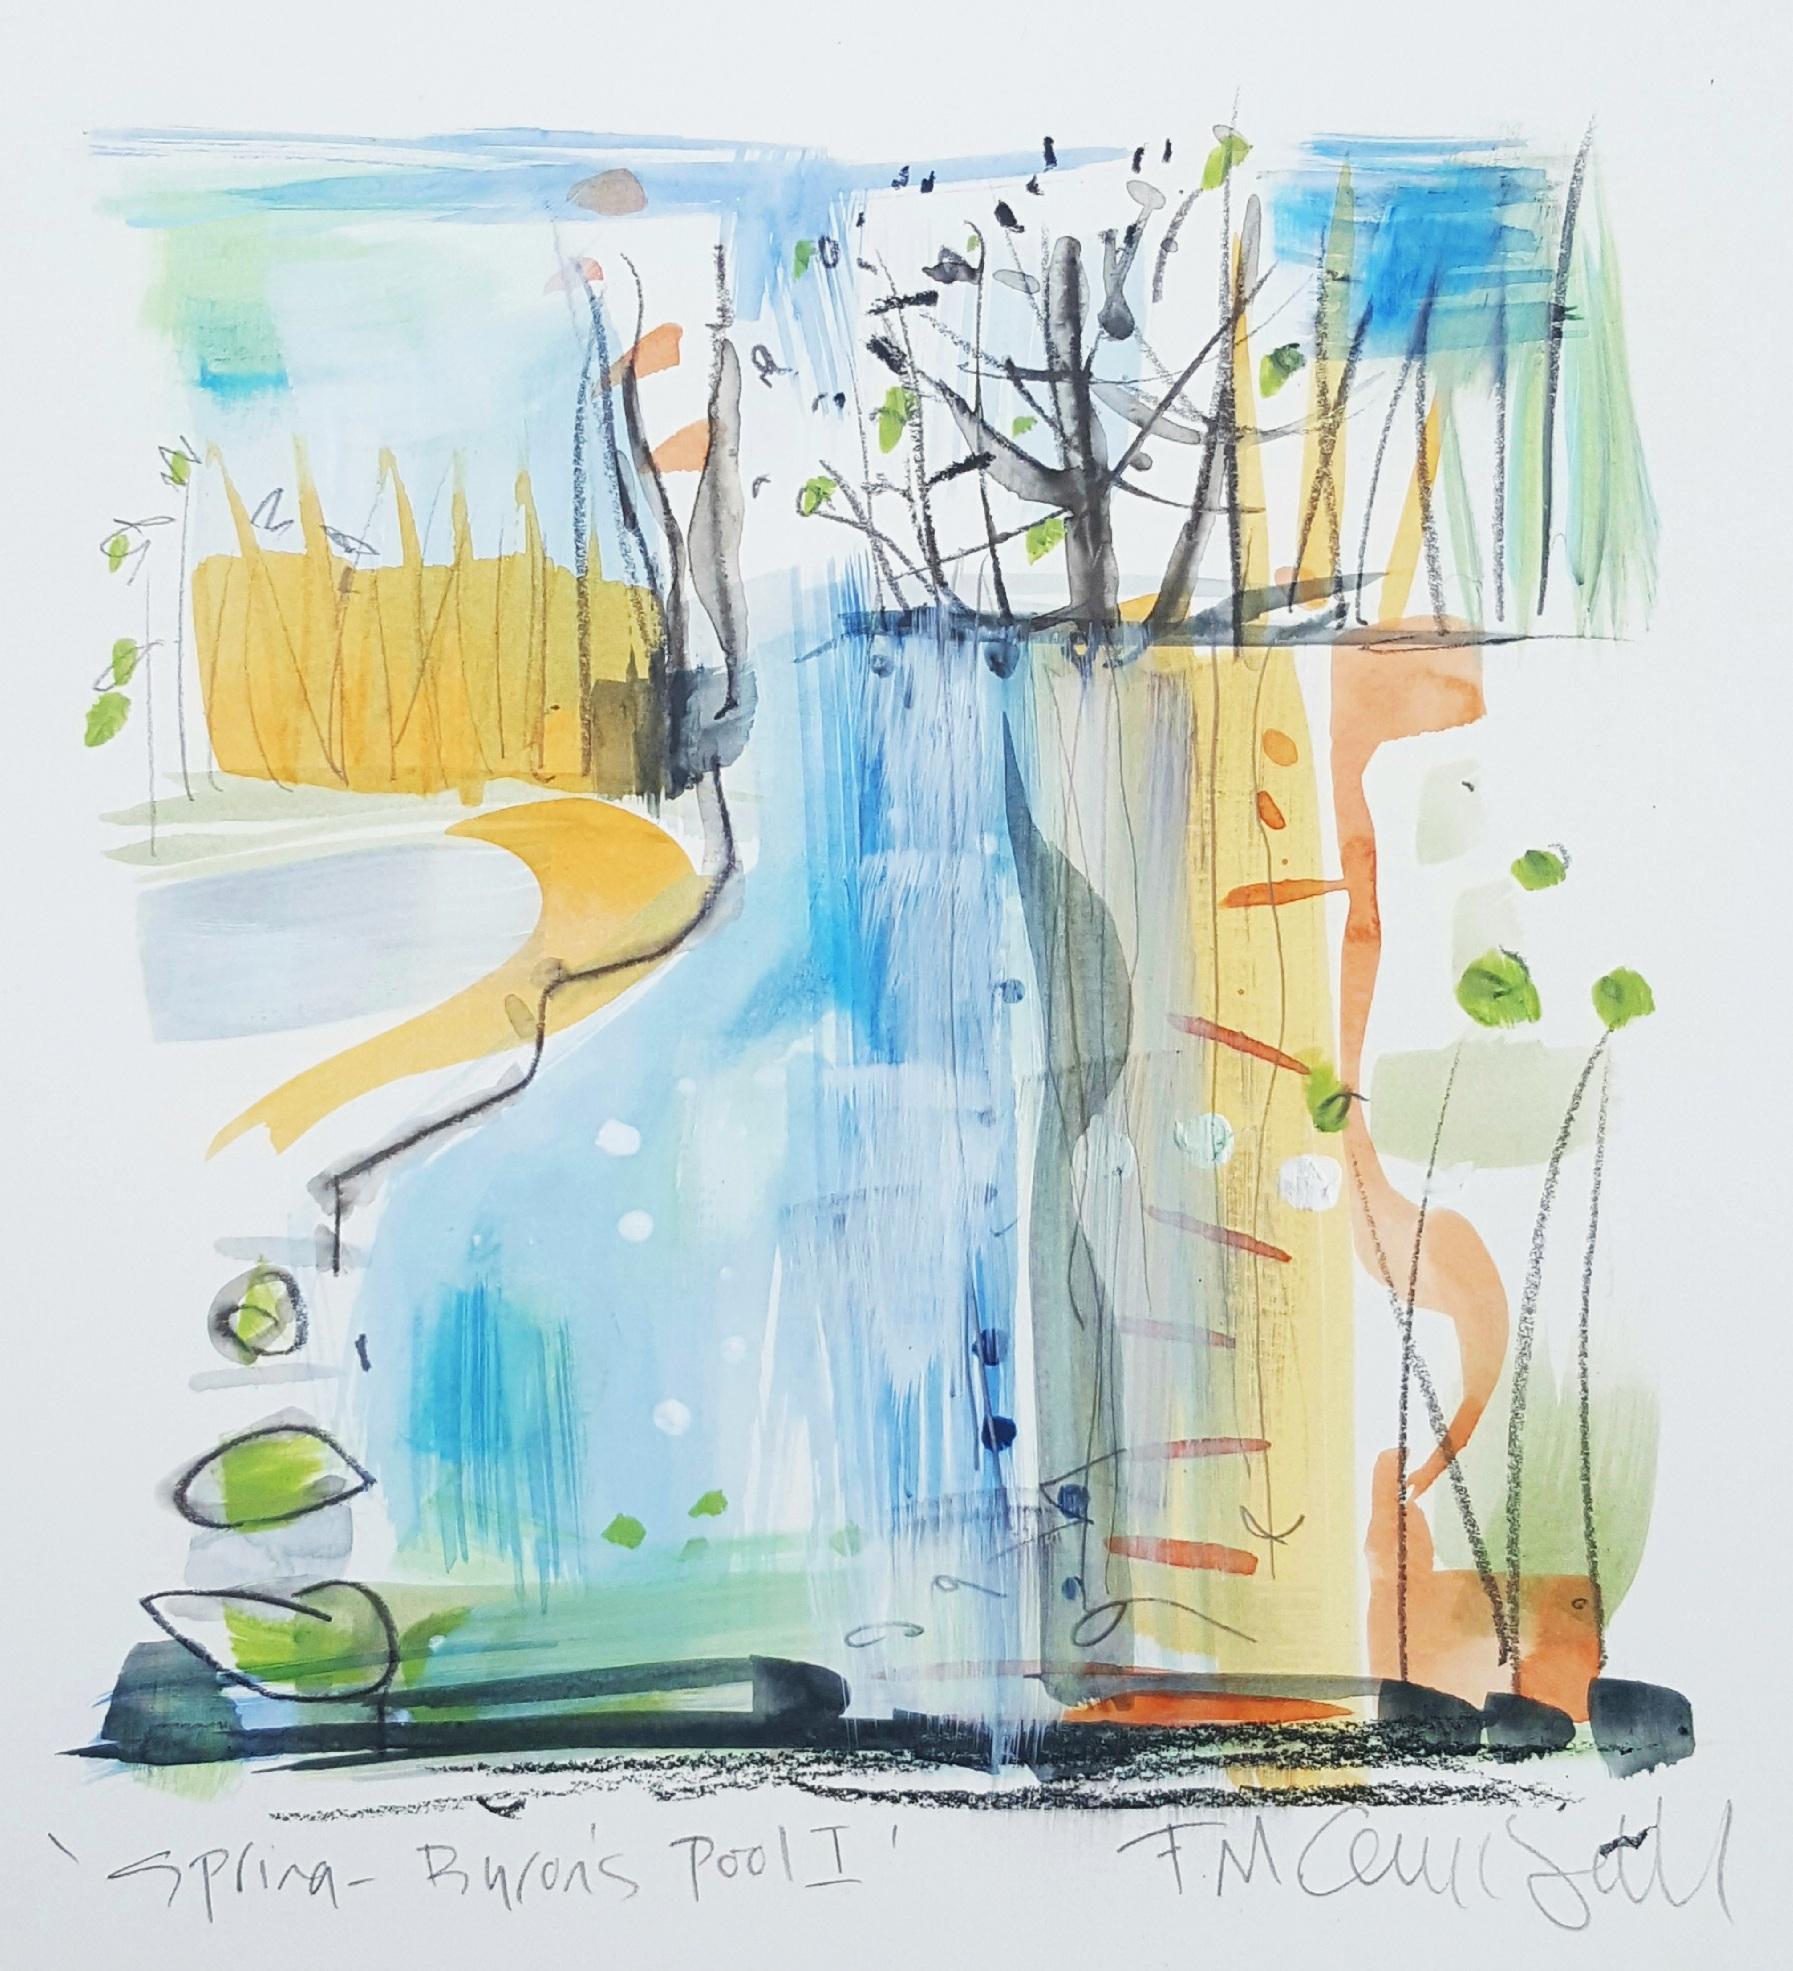 'Spring - Byron's Pool I'